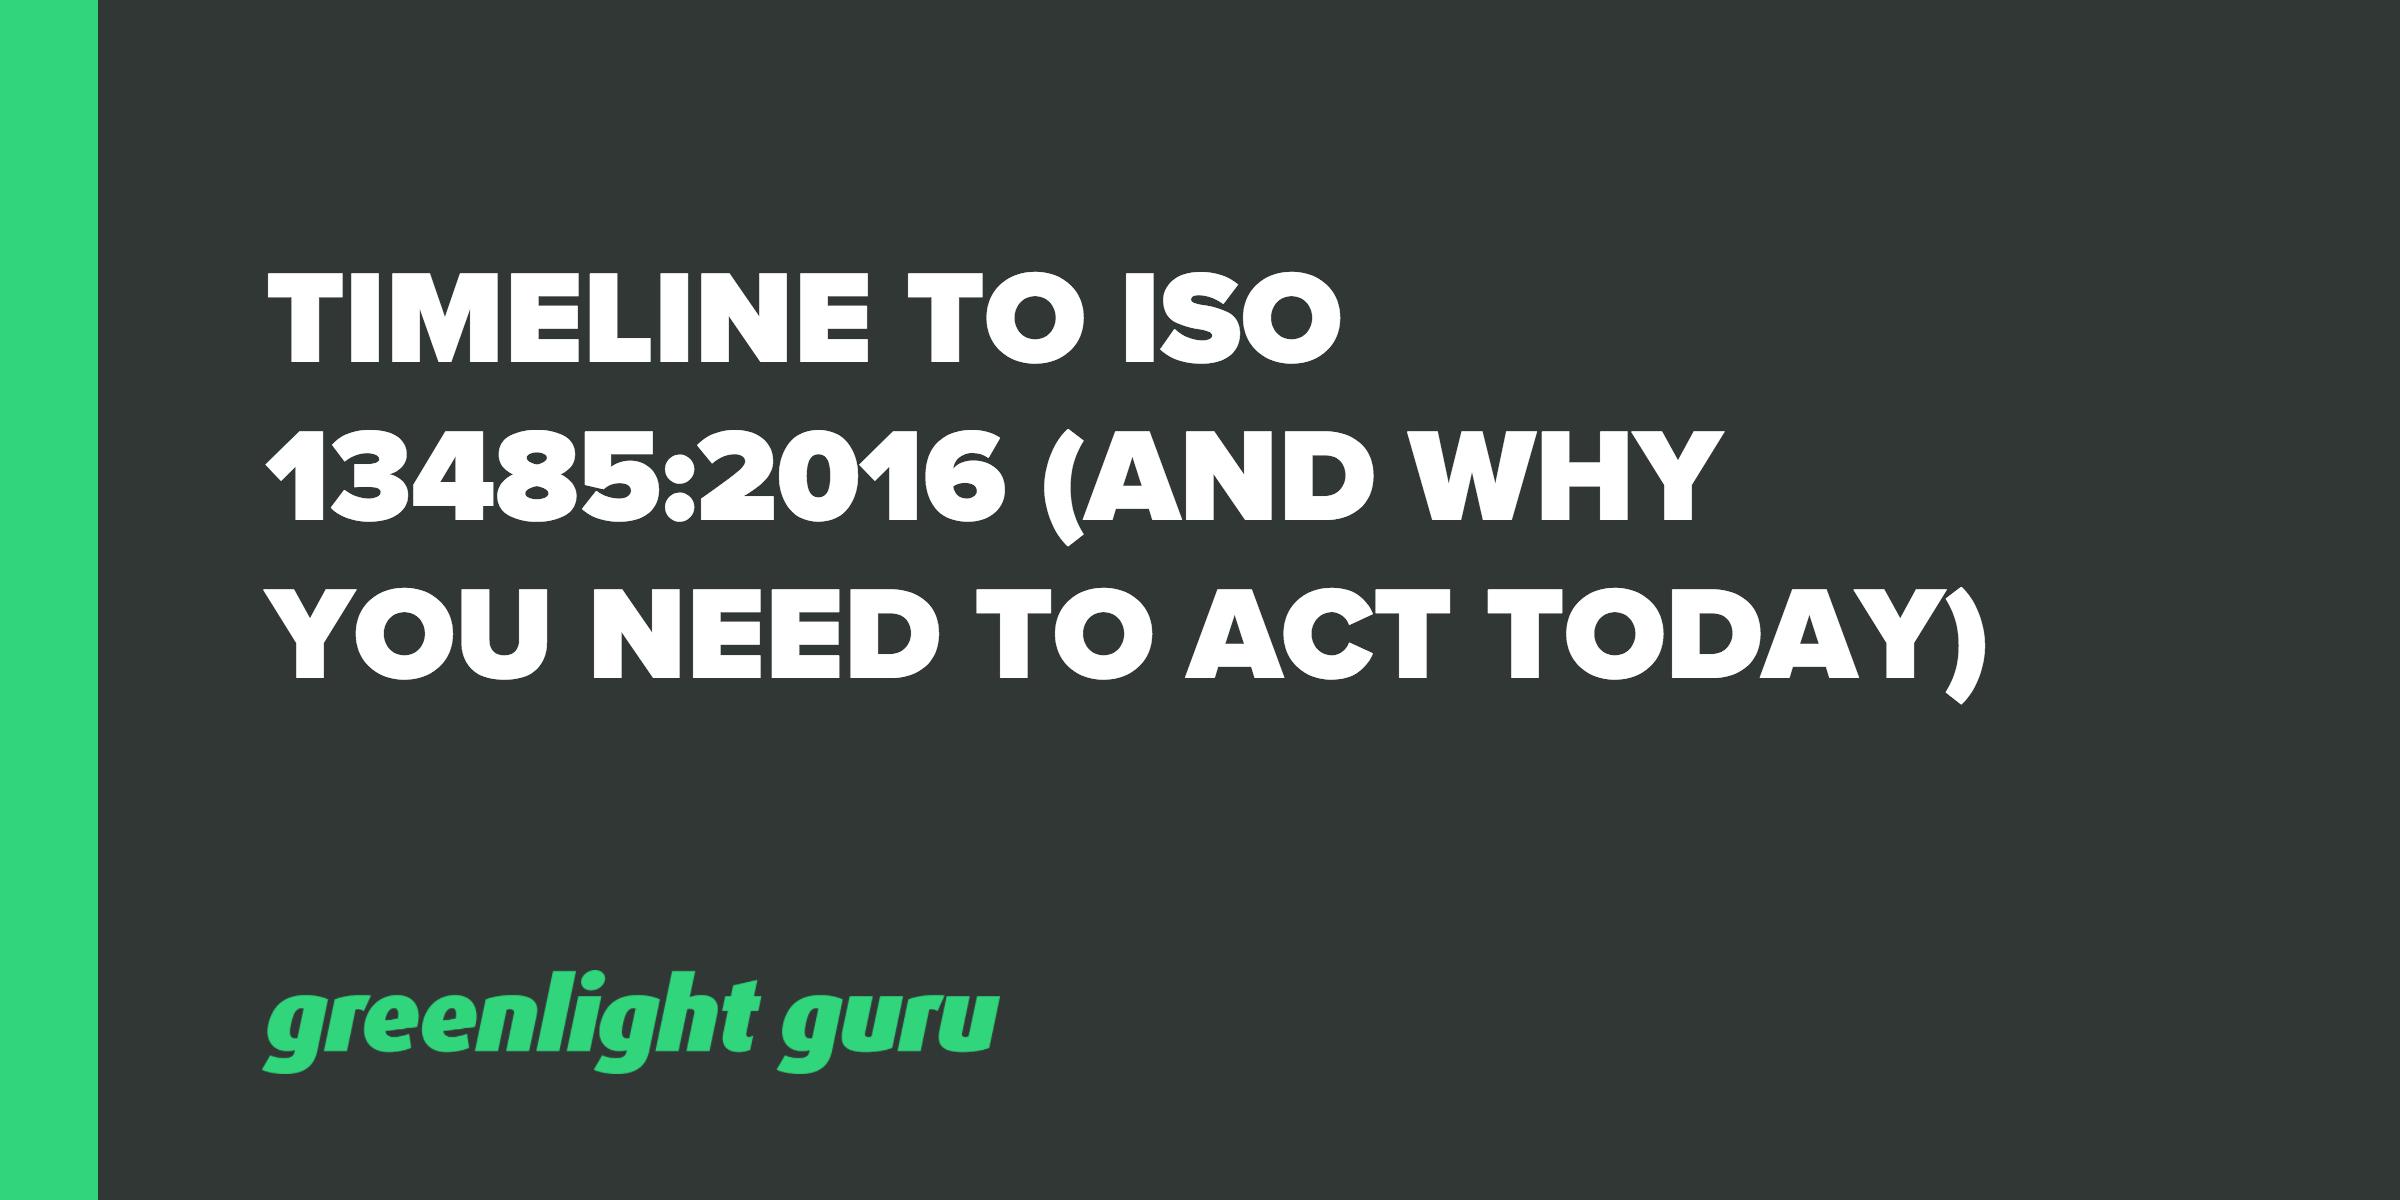 ISO_13485-2016_timeline